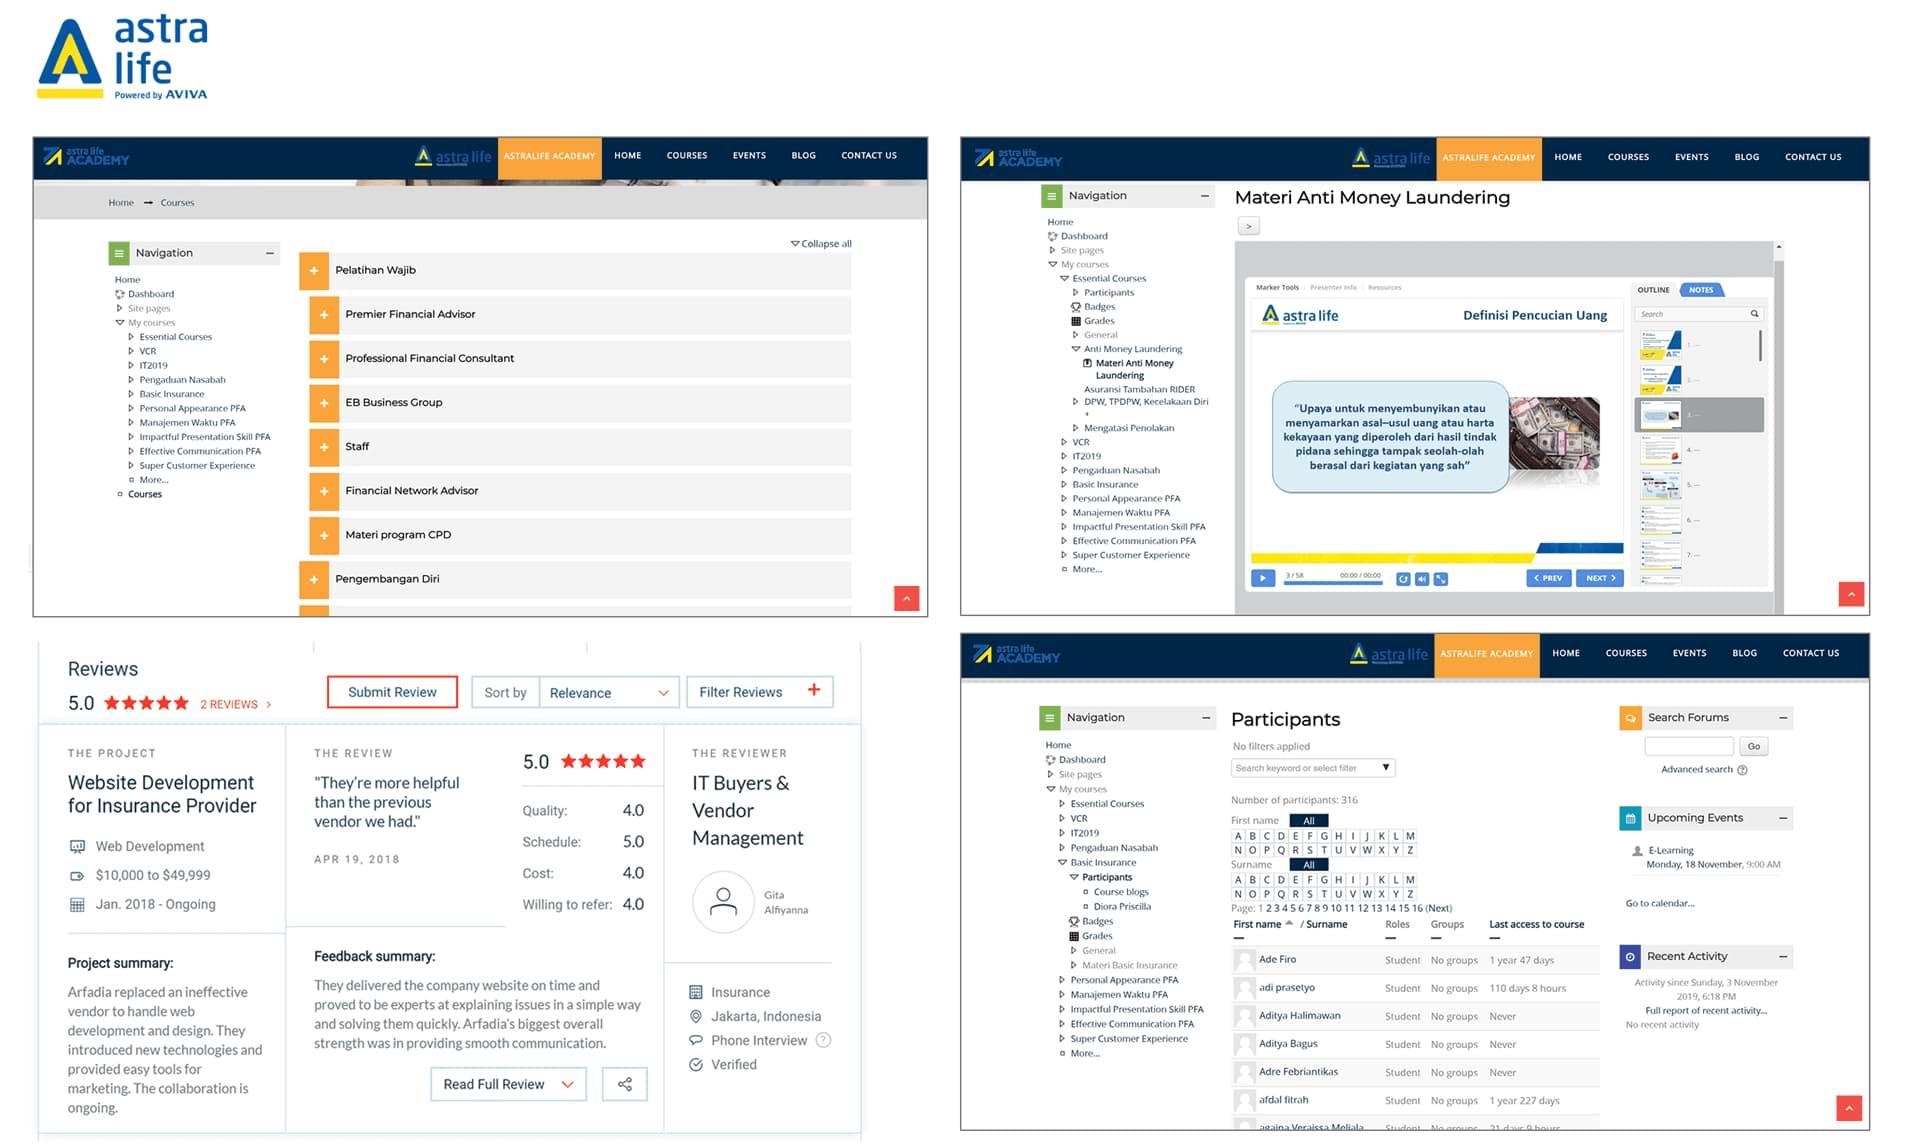 Portfolio Arfadia Jasa Pembuatan E-Learning Terbaik di Indonesia